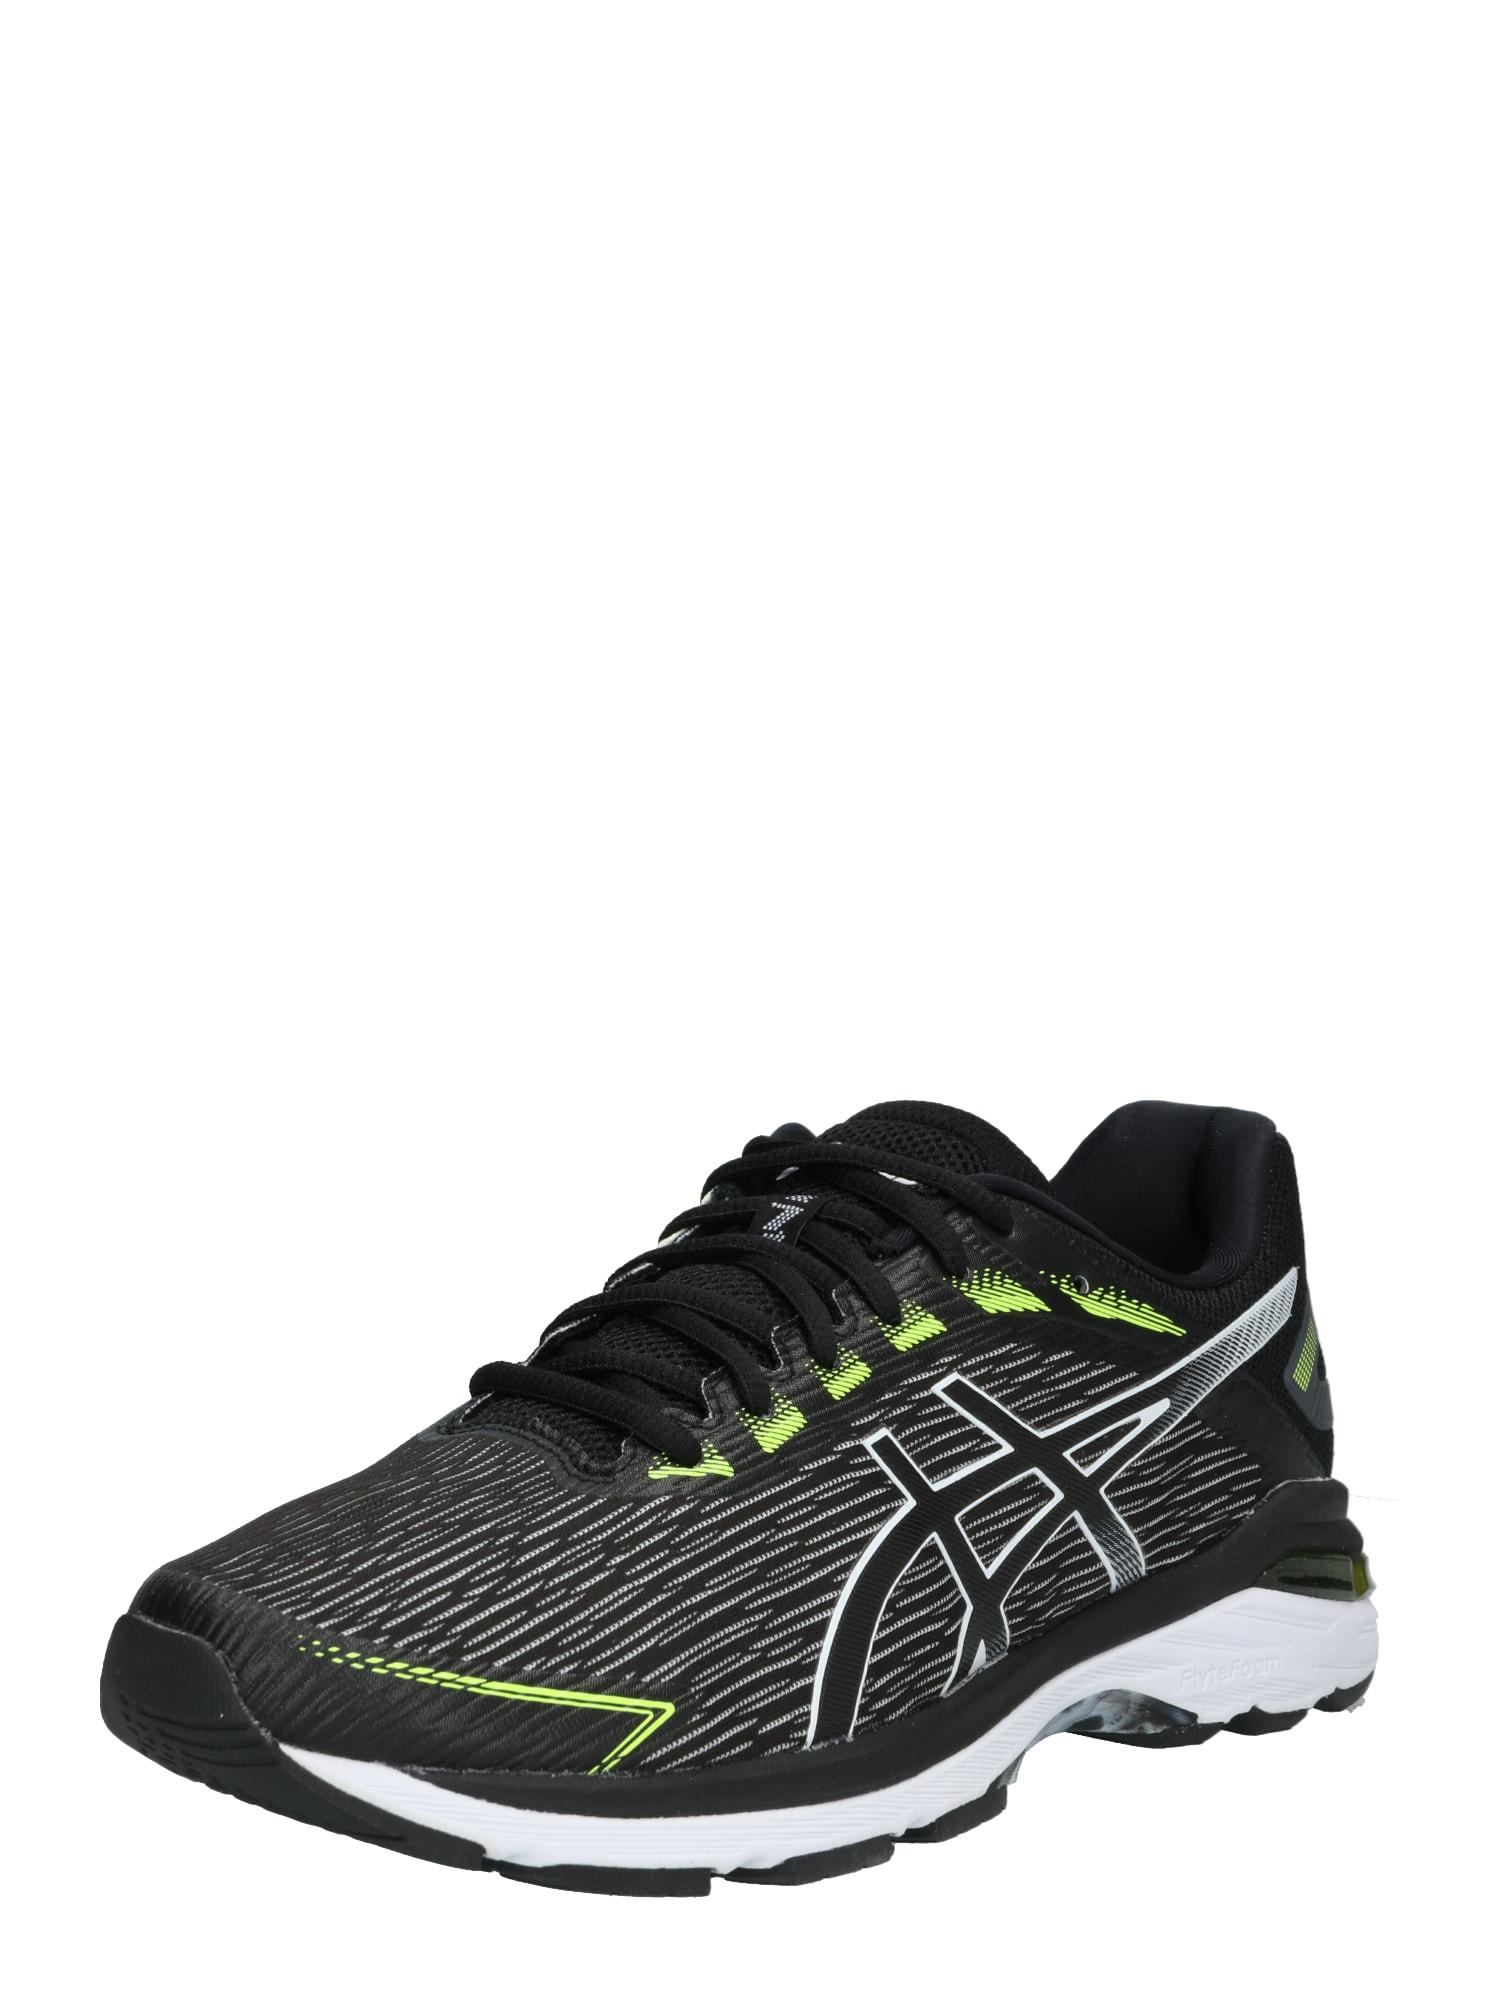 Běžecká obuv GT-2000 7 TWIST žlutá šedá černá ASICS